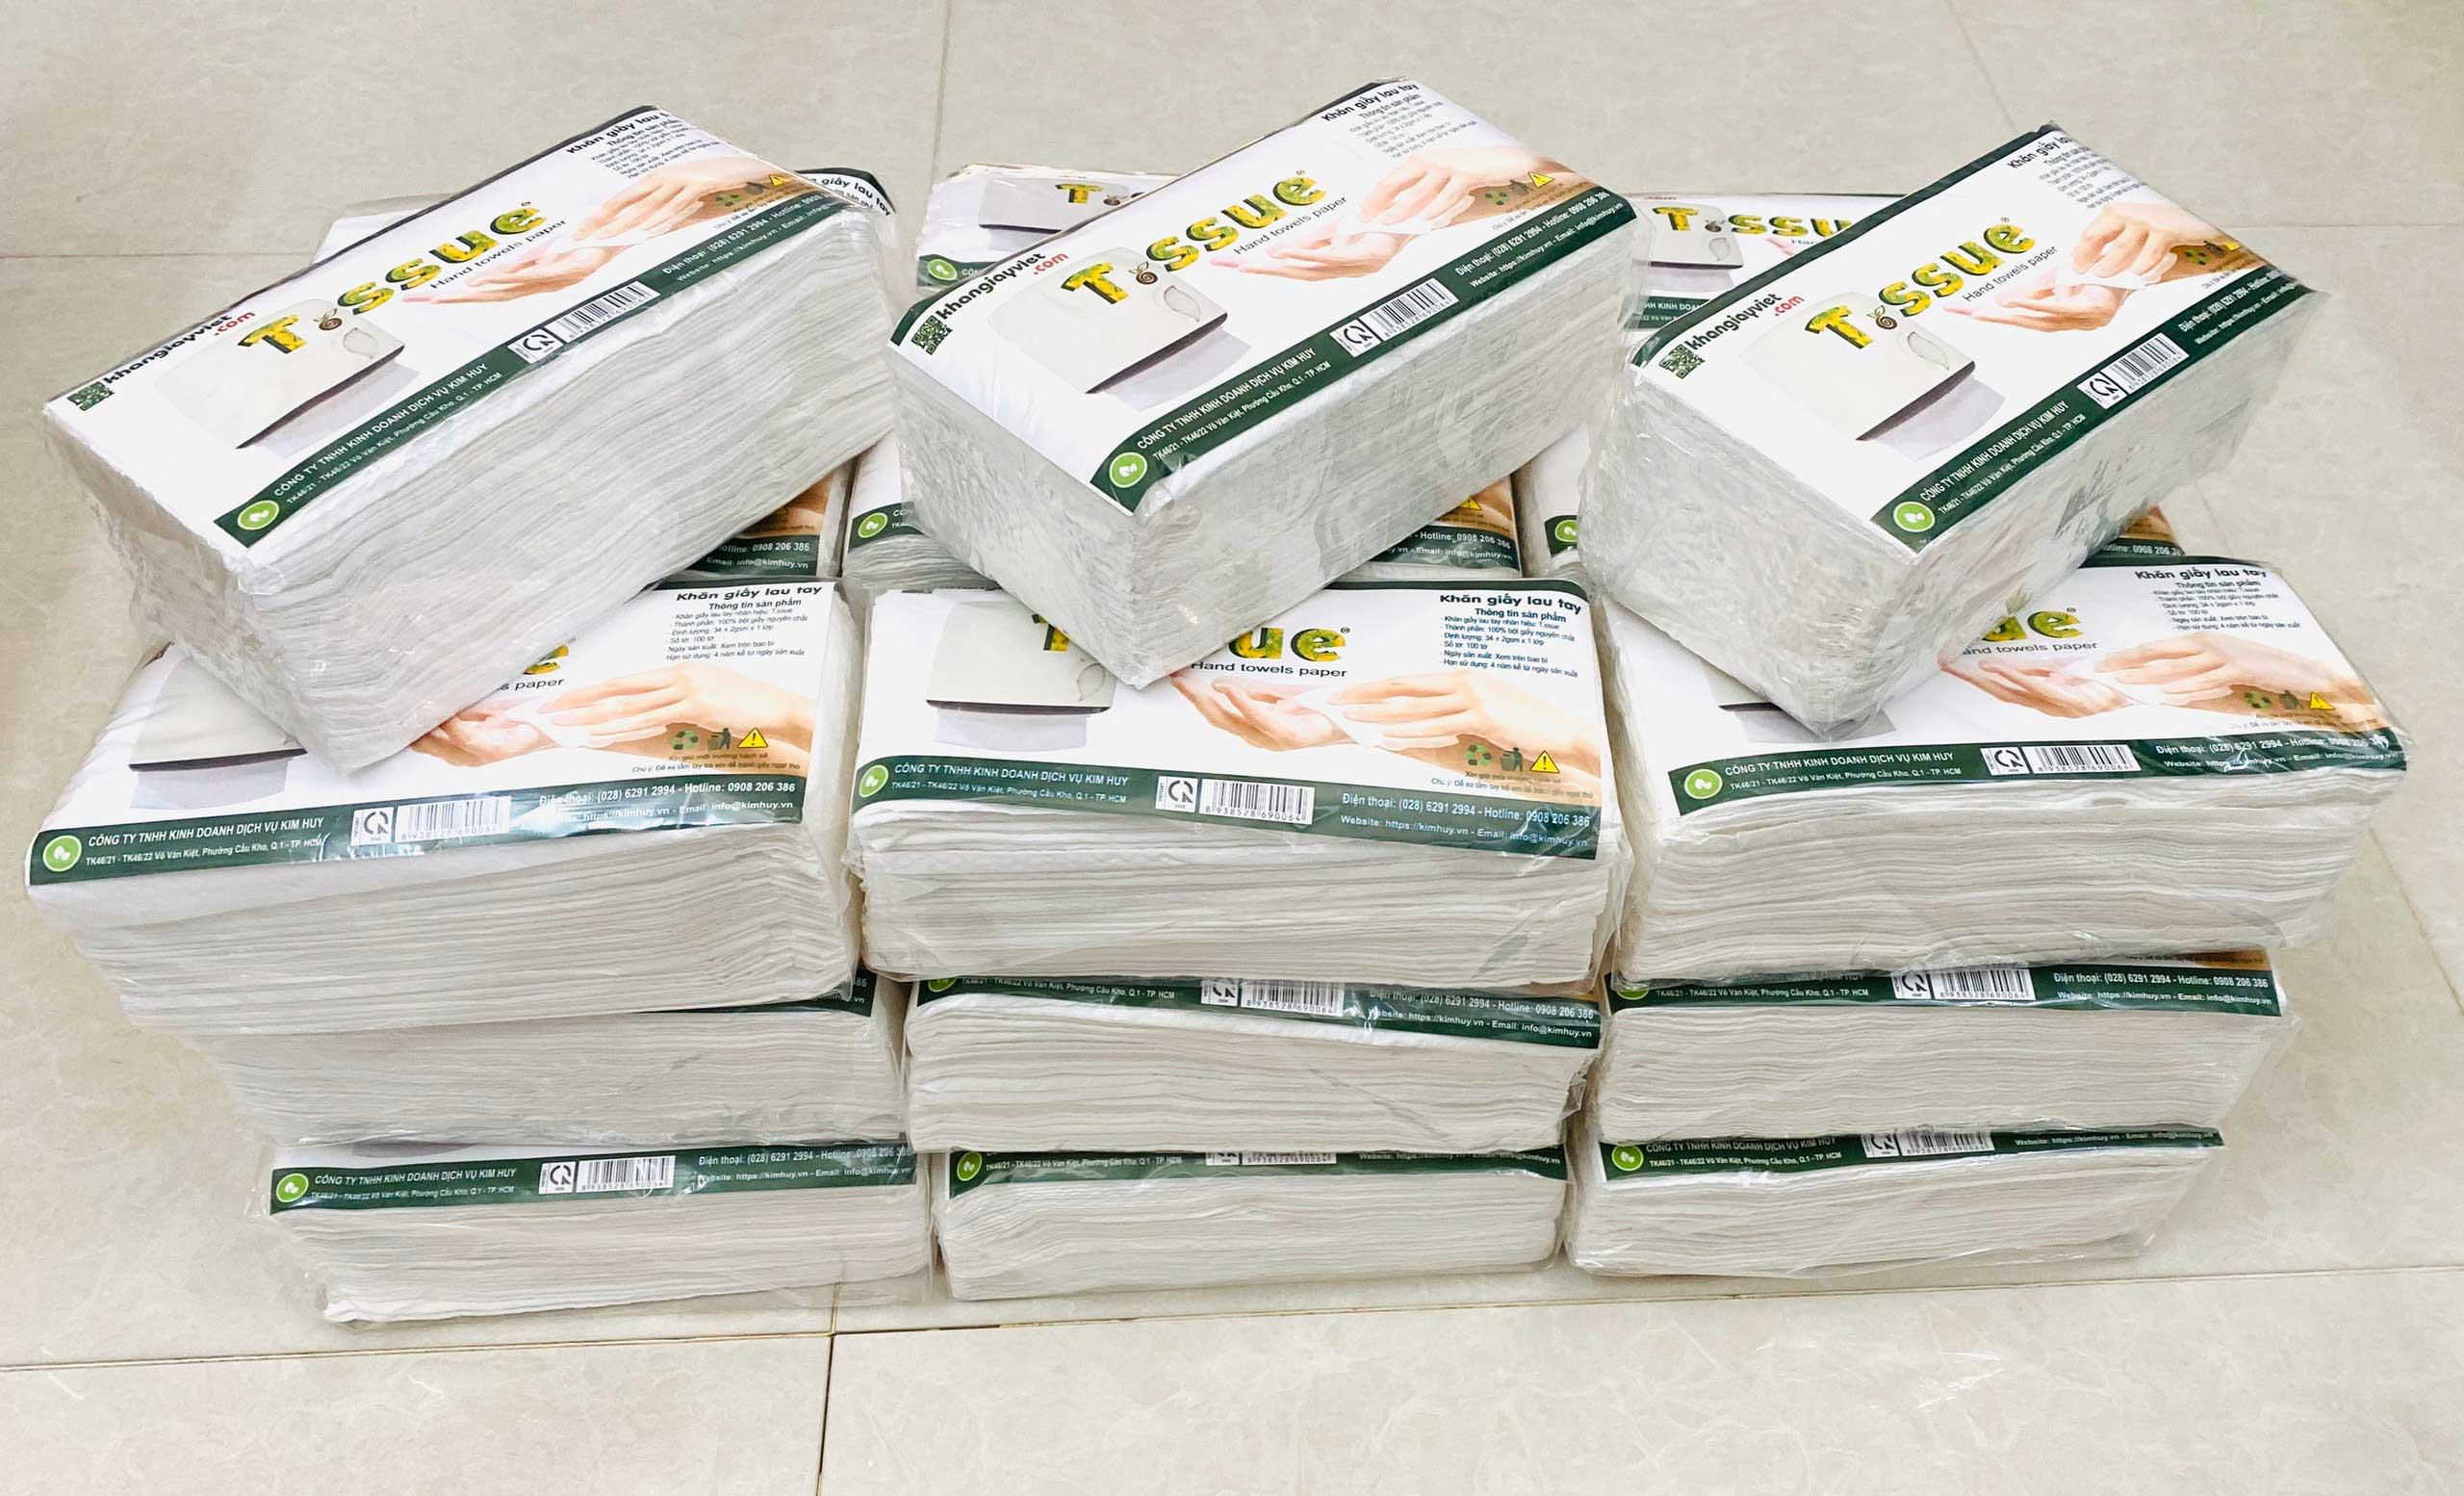 Khăn giấy lau tay T.ssue (30 gói)